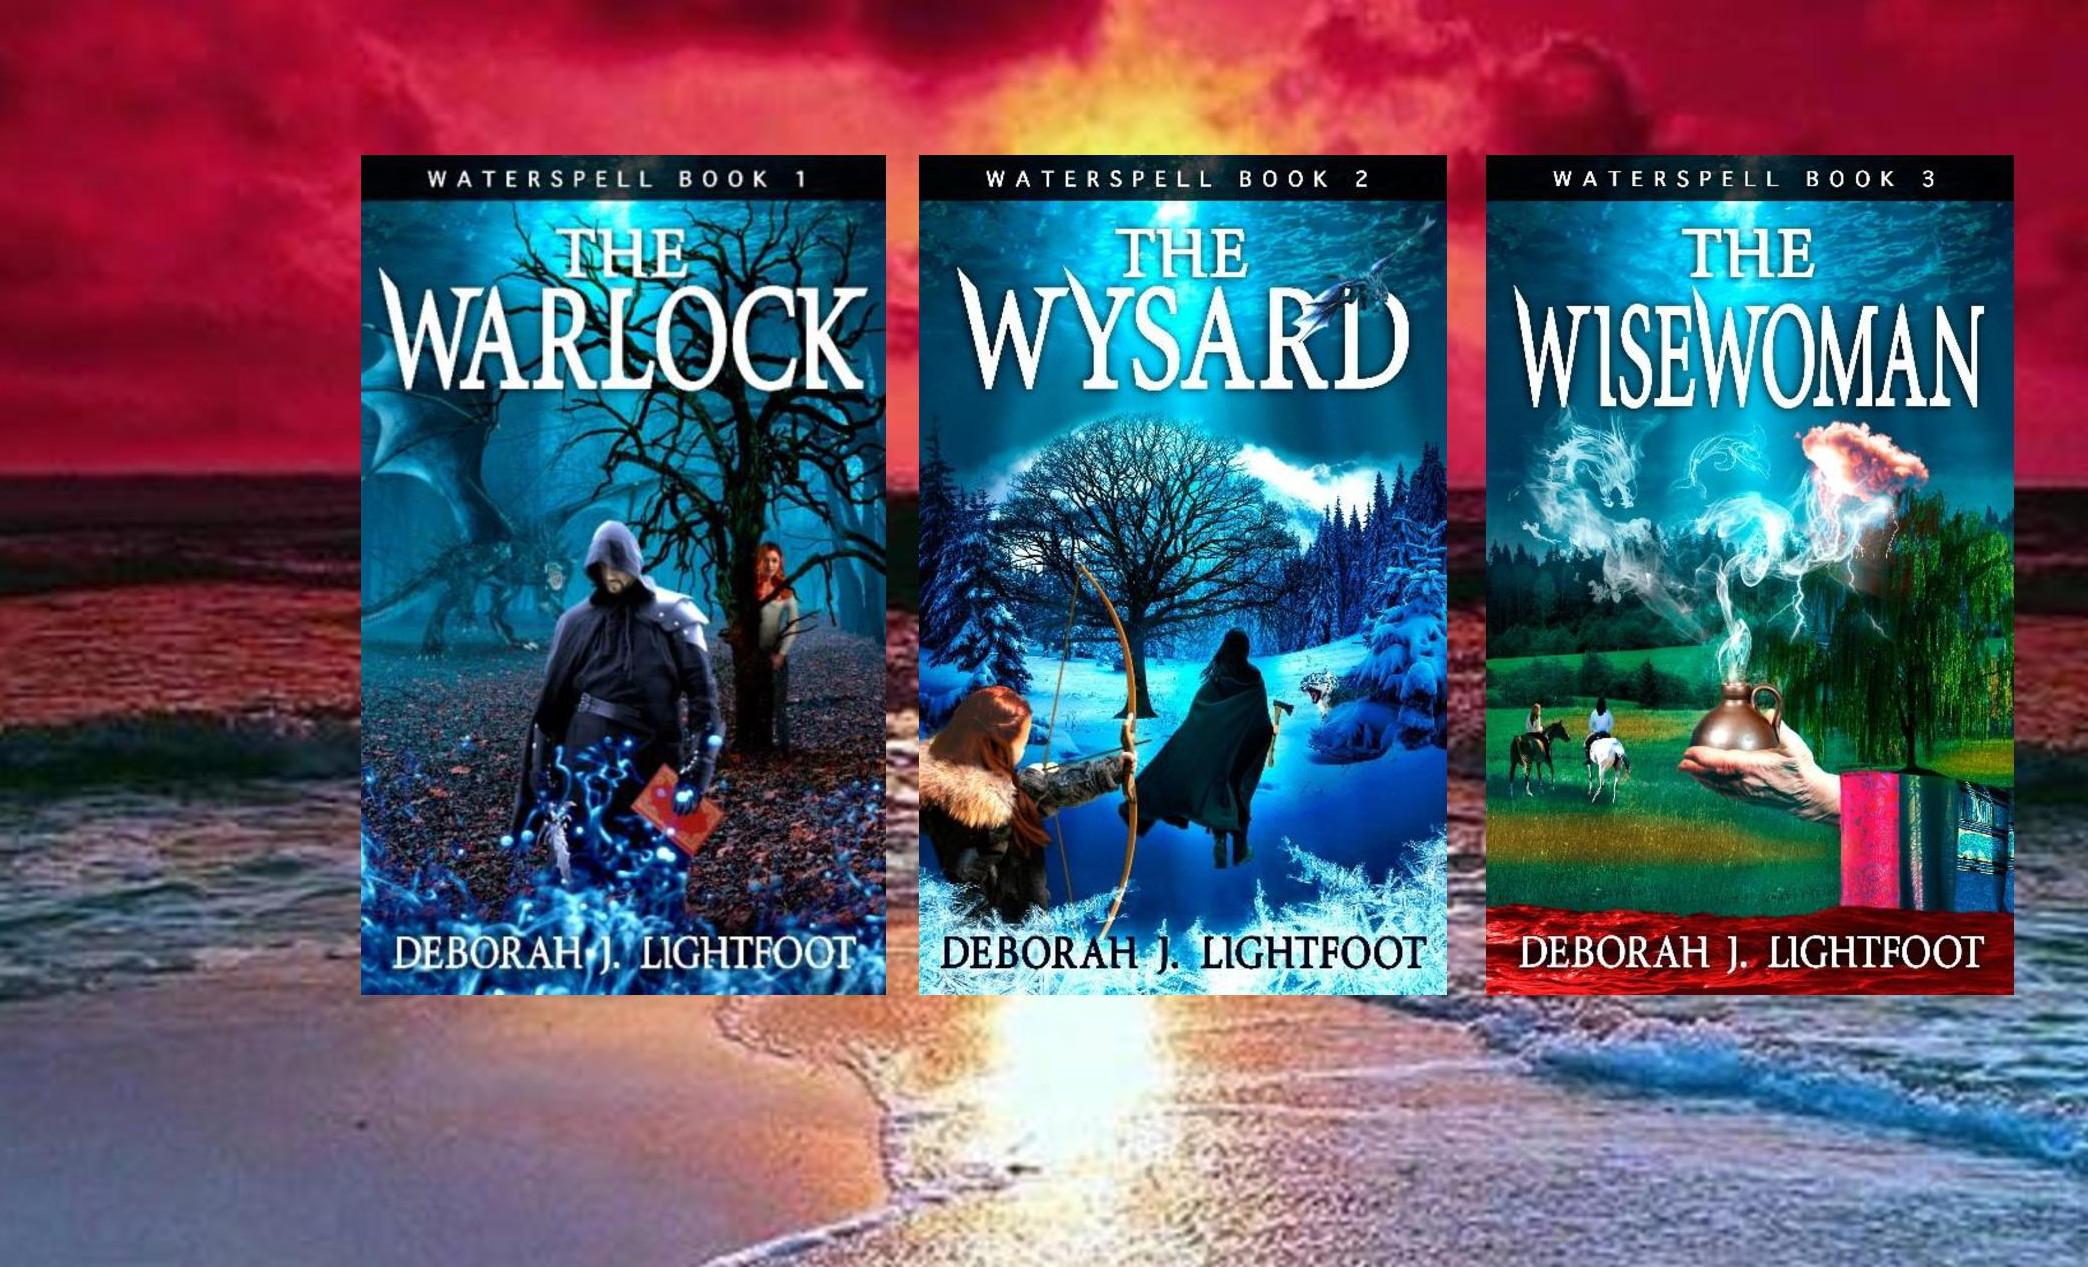 Waterspell, a fantasy trilogy by Deborah J. Lightfoot